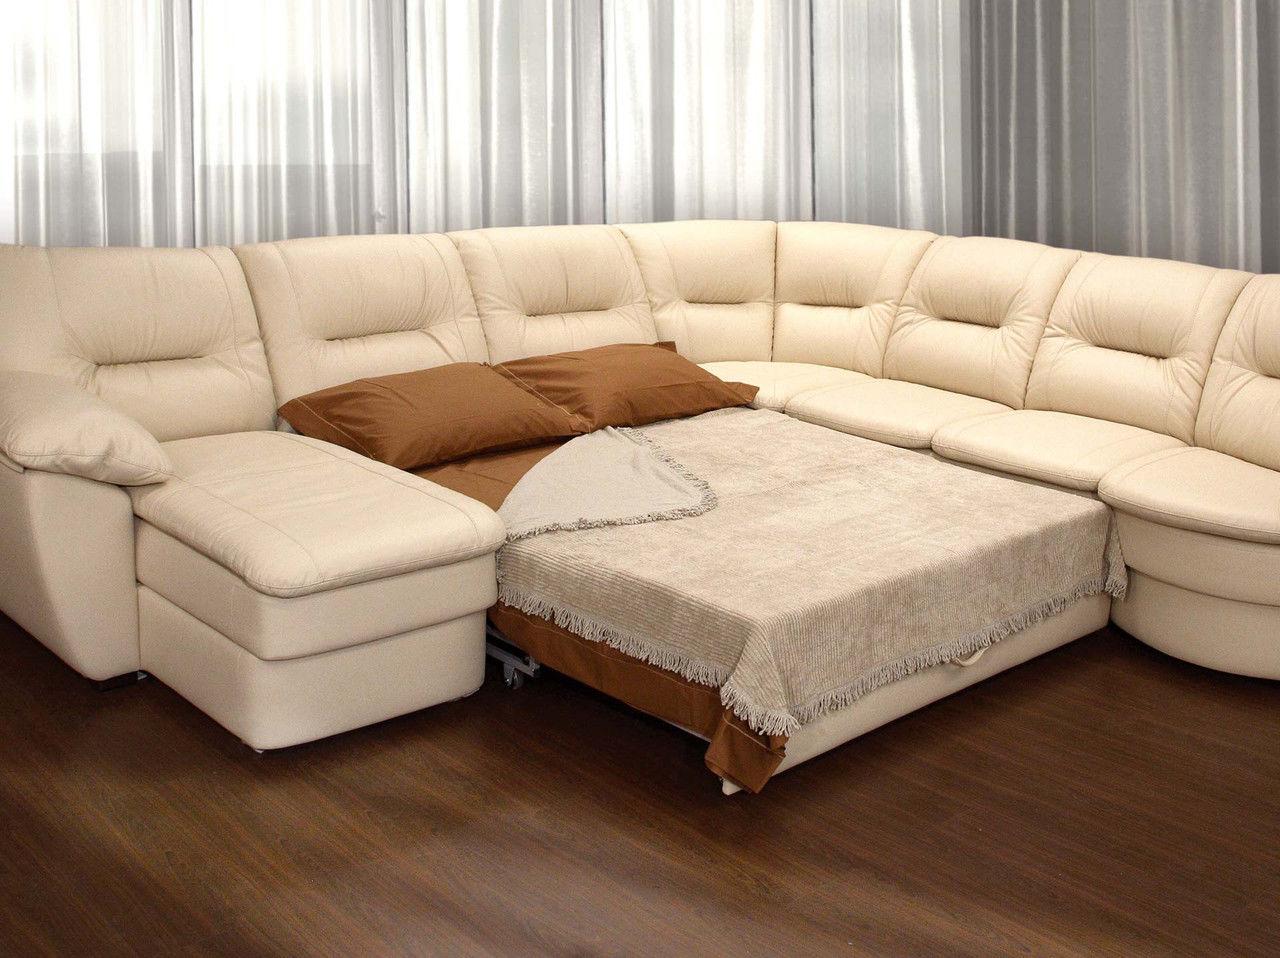 Мягкую мебель угловую